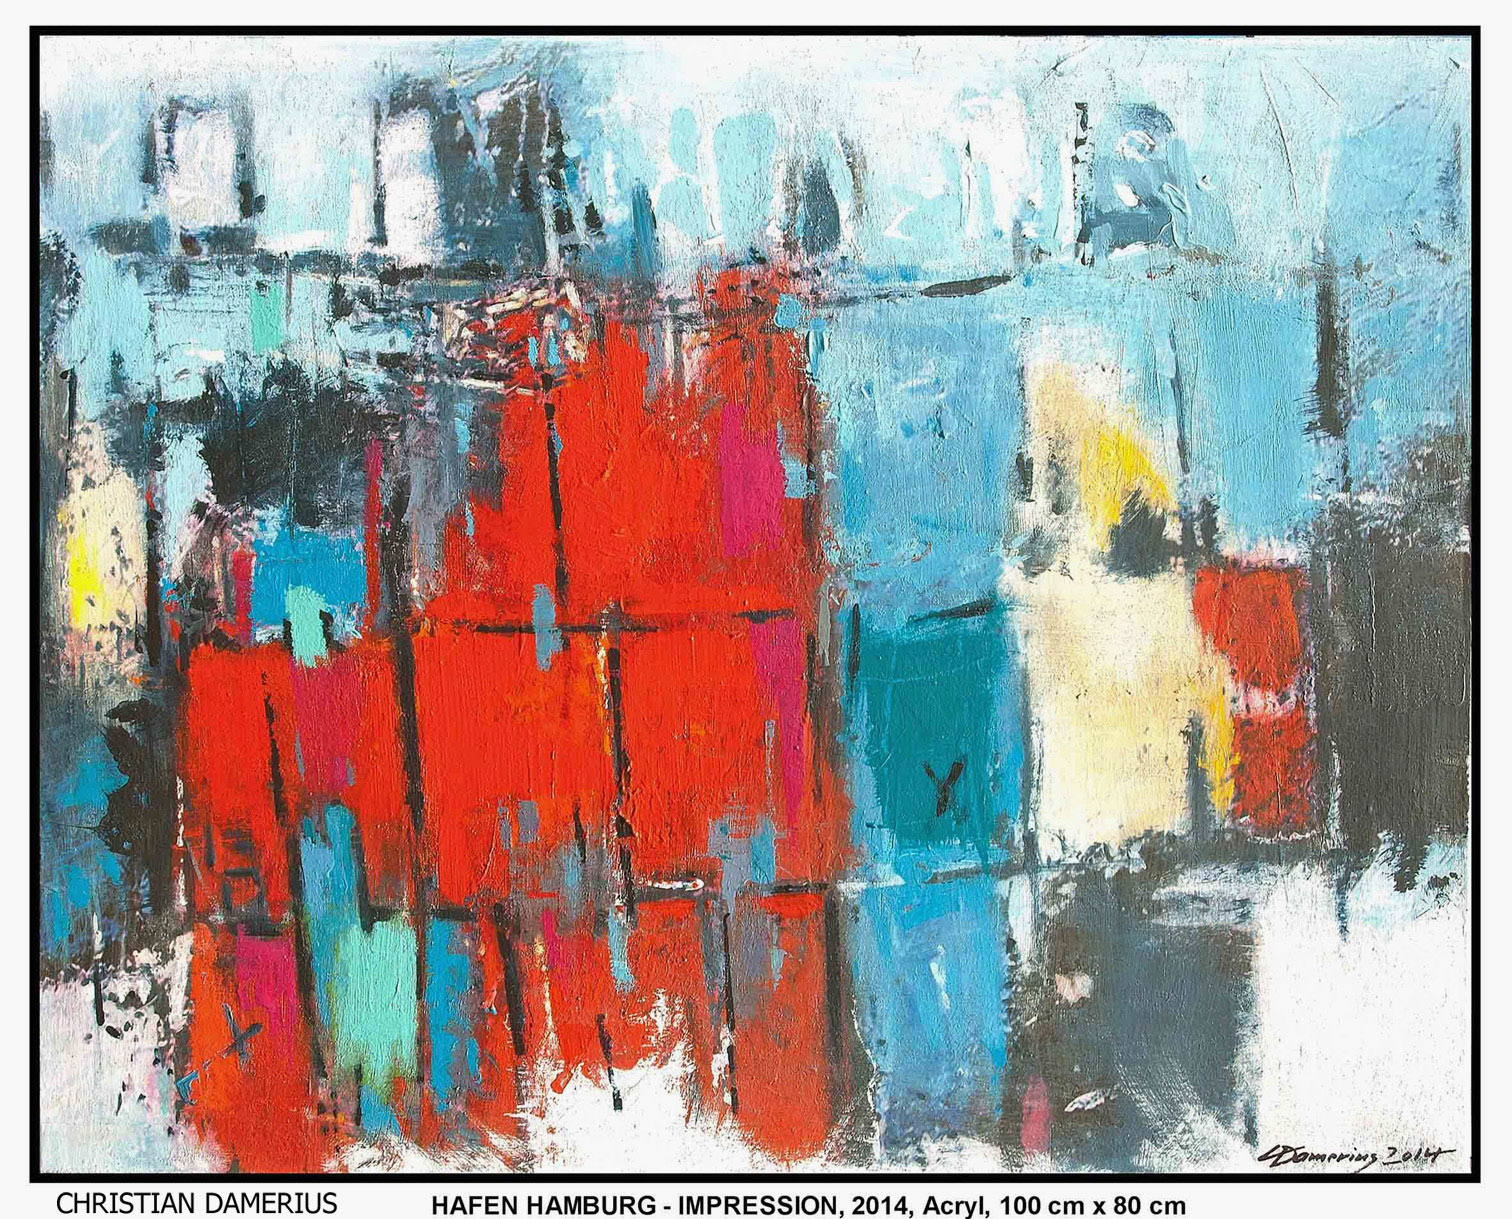 christian damerius hamburger malerei bilder kunstdrucke leinwand moderne auftragsmalerei hamburg. Black Bedroom Furniture Sets. Home Design Ideas